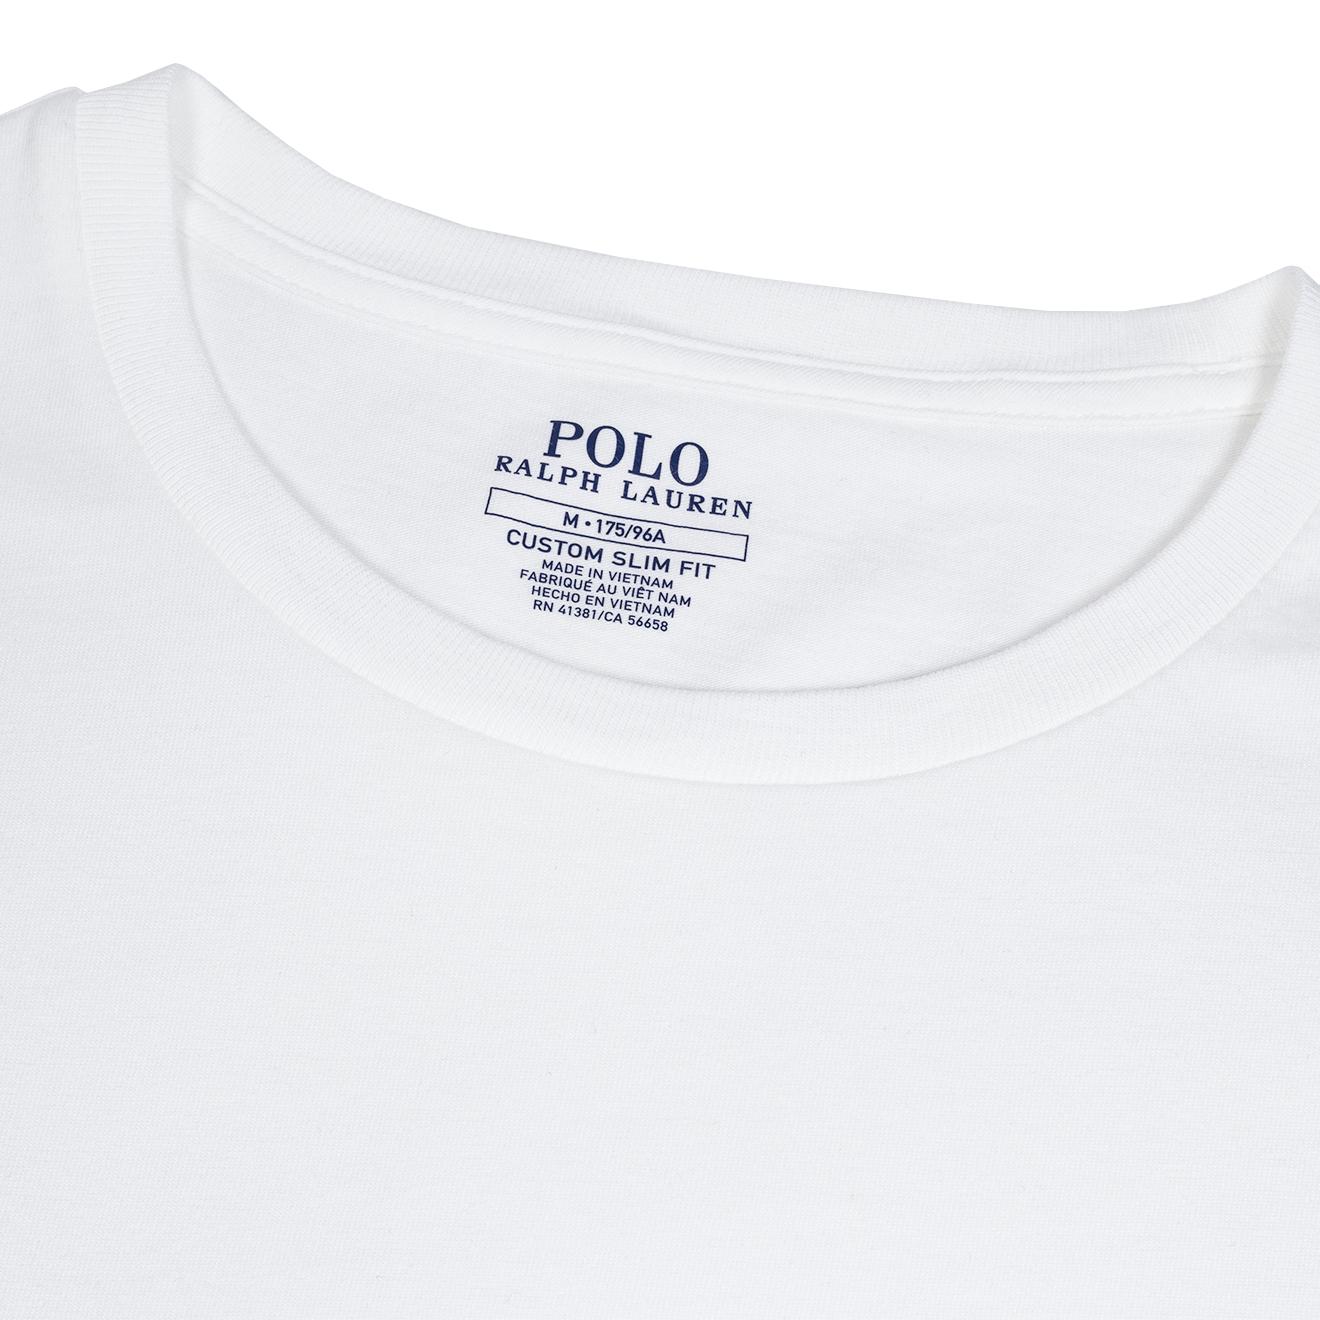 Polo Ralph Lauren Custom Slim Fit Cotton T-Shirt White | The Sporting Lodge